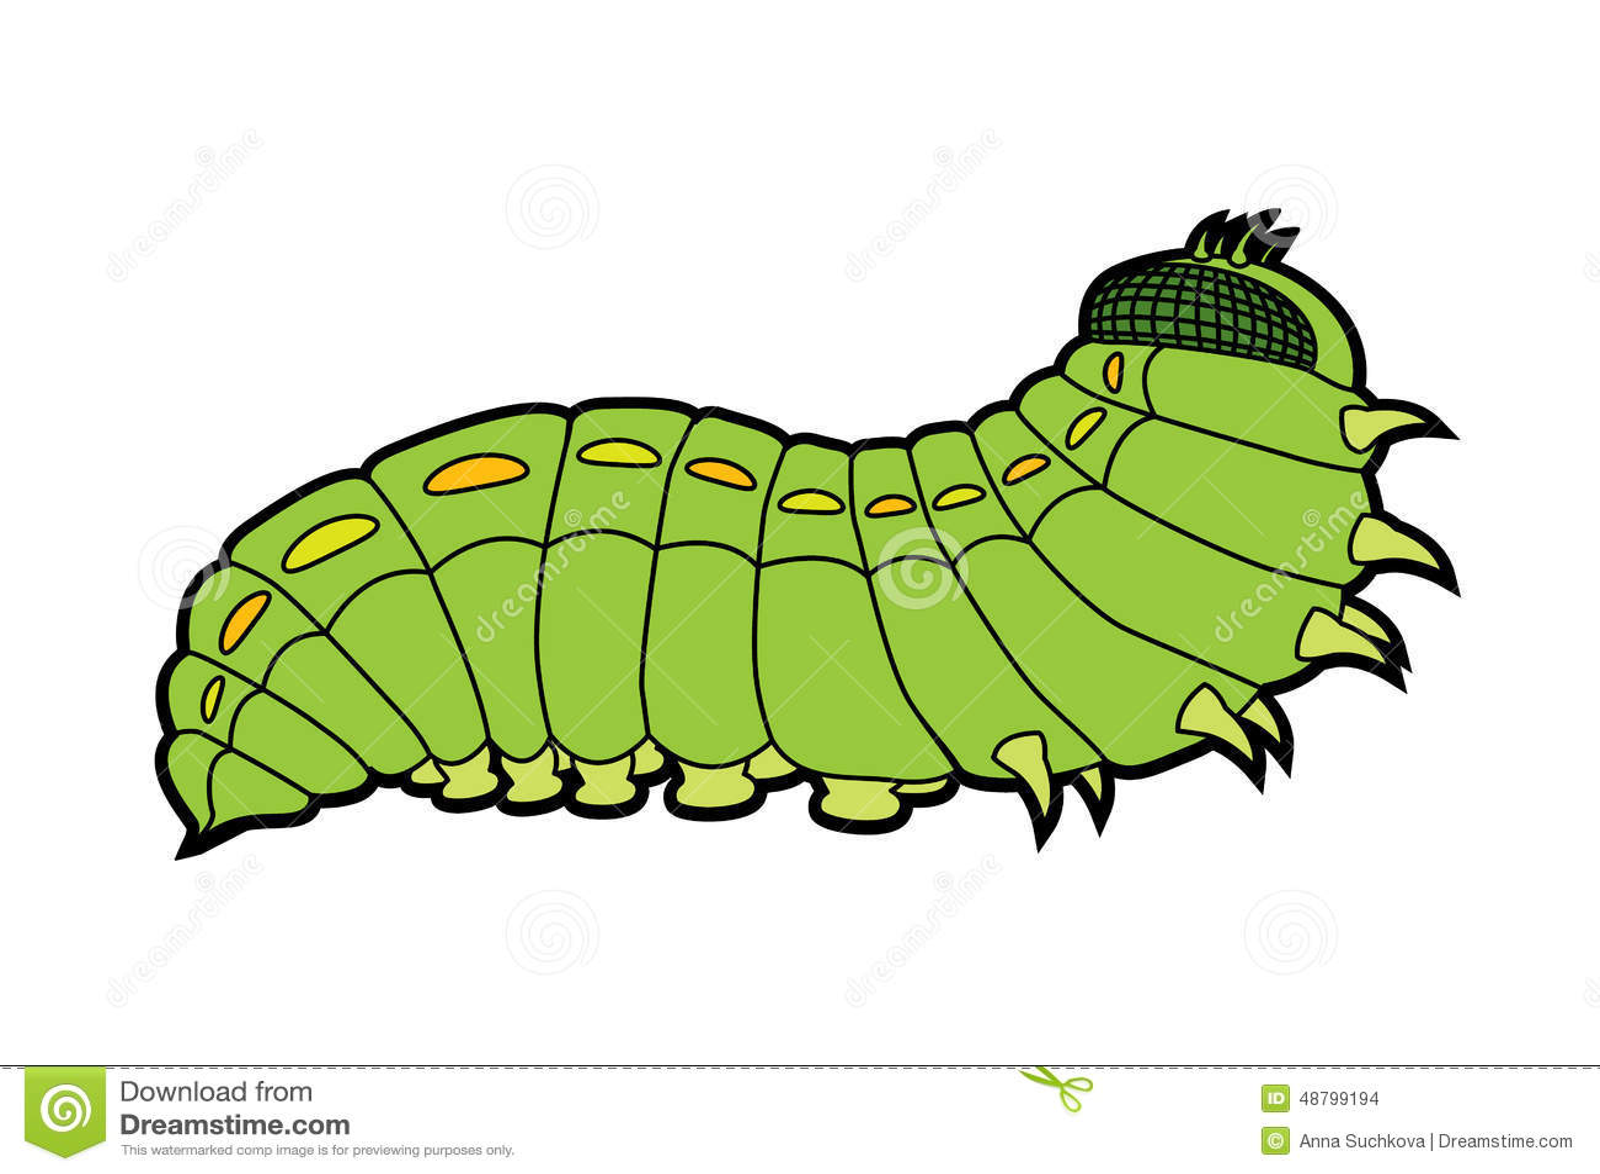 Caterpillar Butterfly Stock Vector Illustration Of Wildlife 48799194